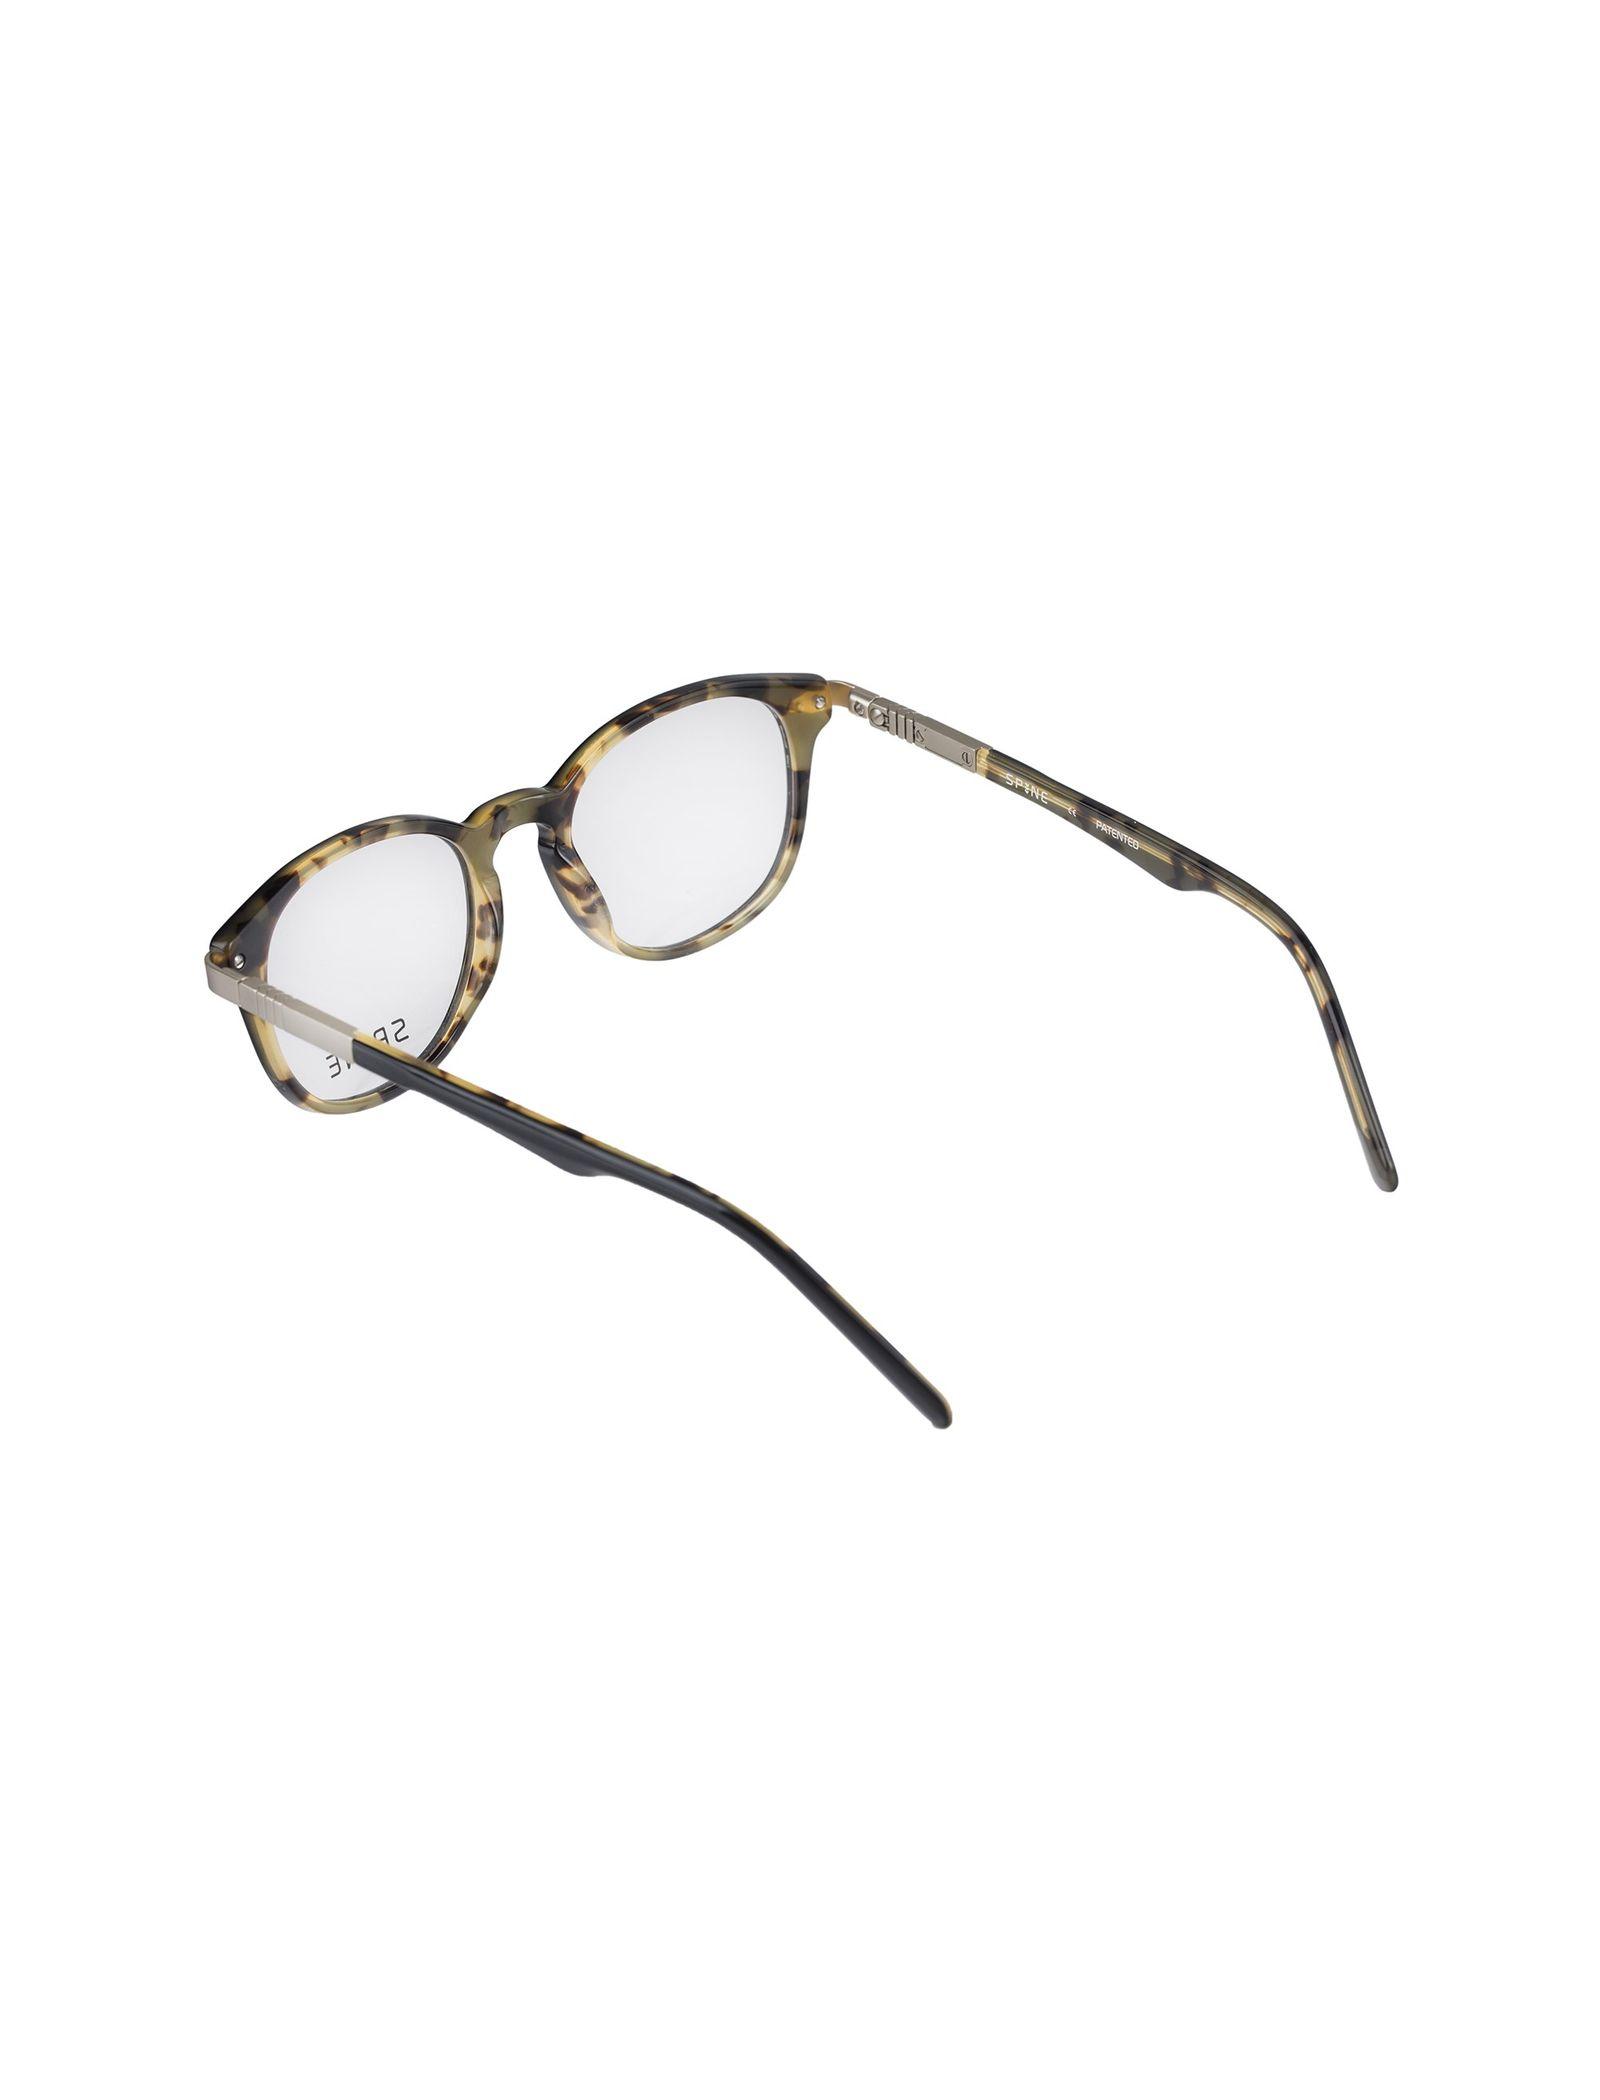 عینک طبی پنتوس مردانه - اسپاین - مشکي  - 3